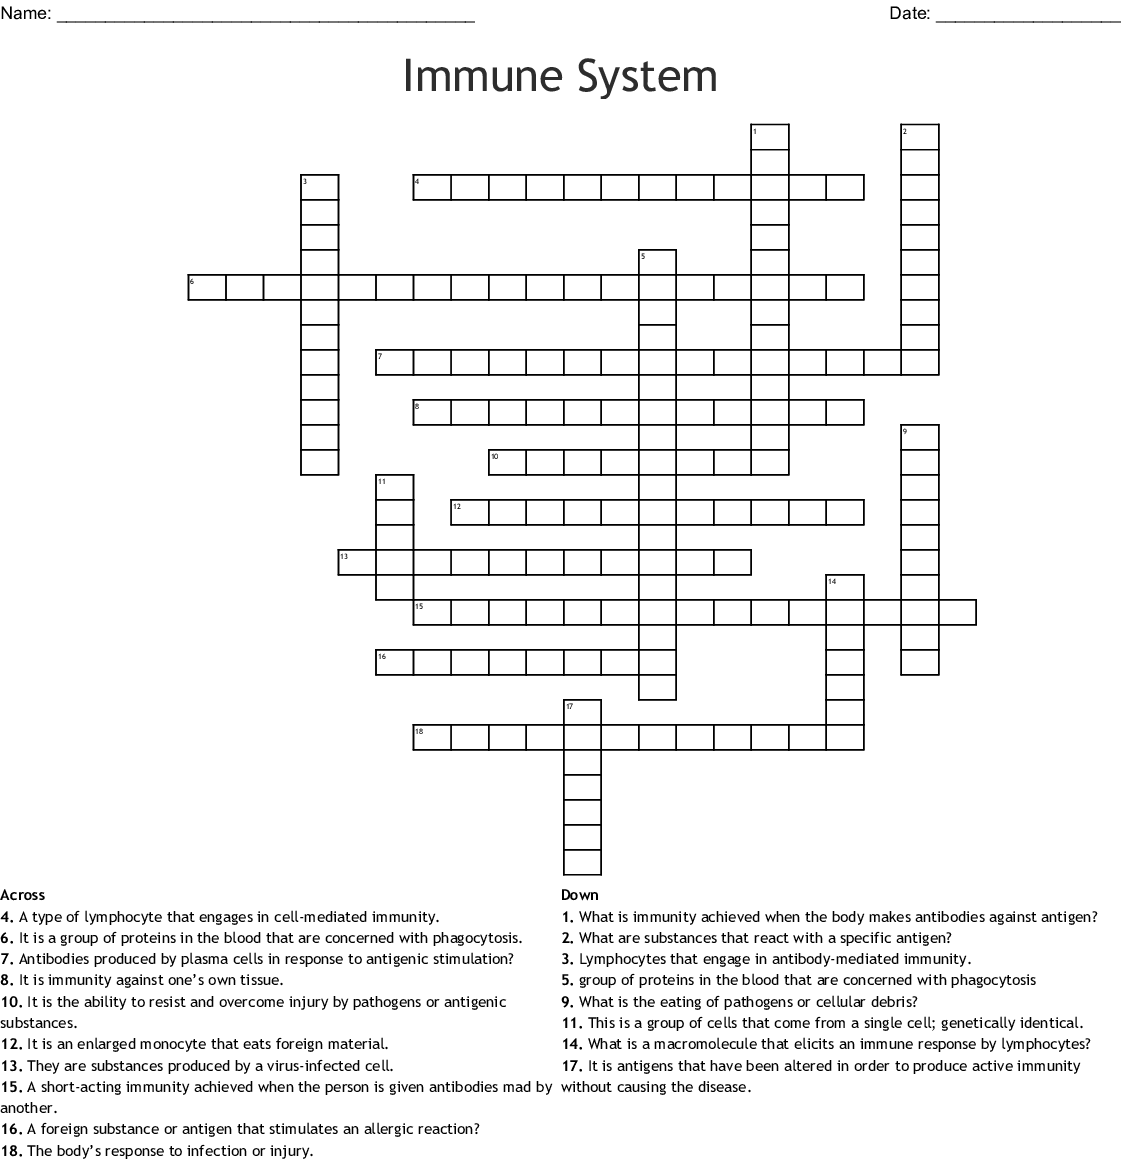 The Immune System Crossword